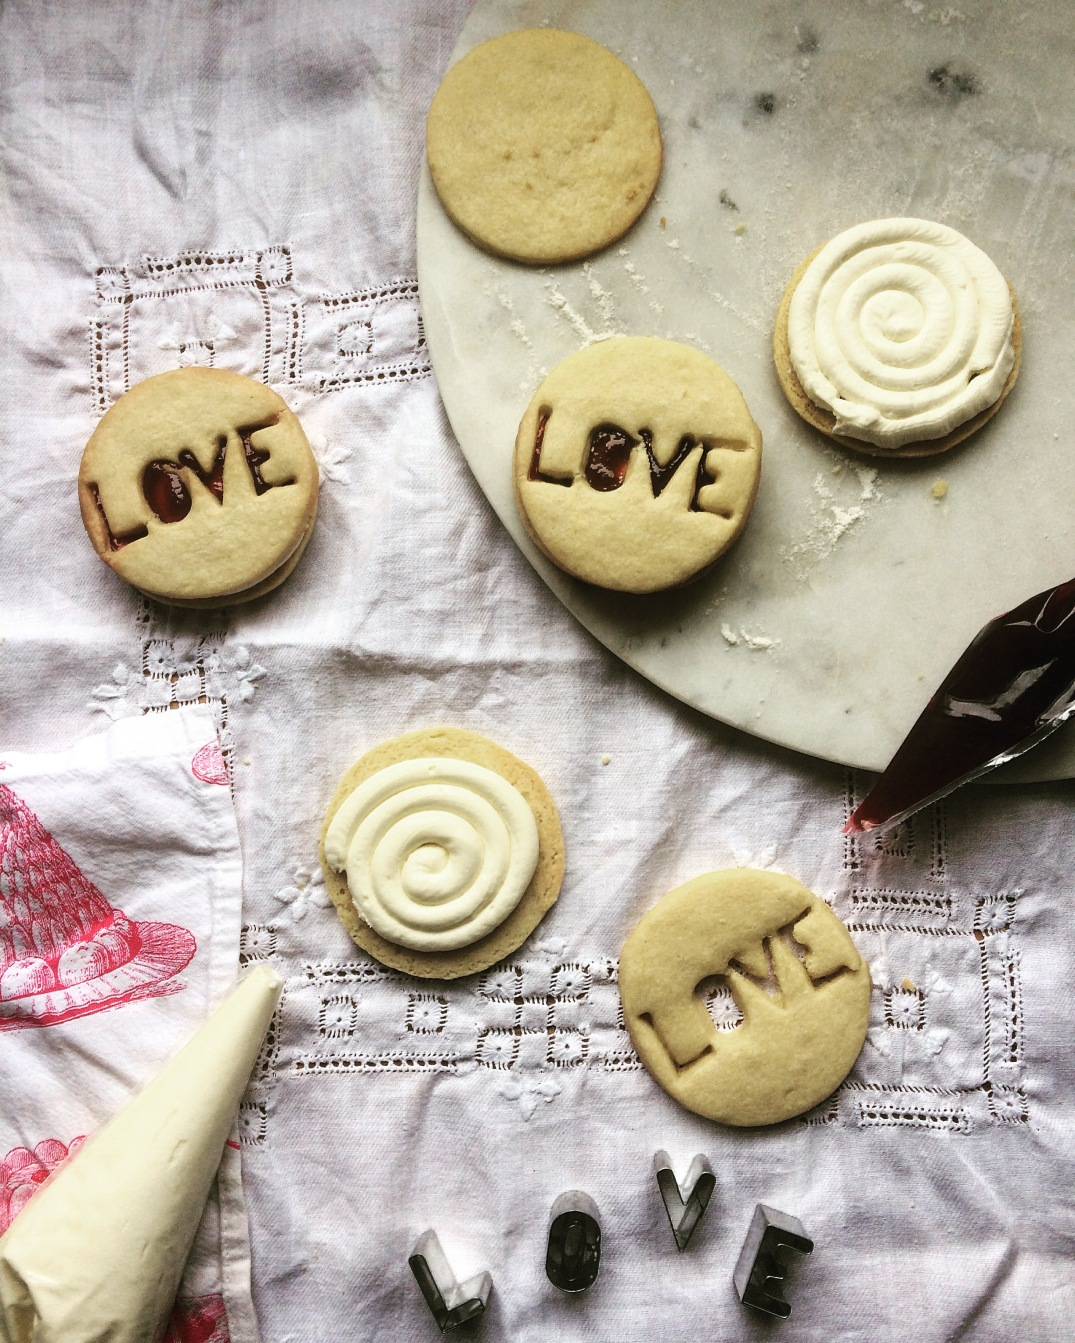 Jammy Dodgers - Sky Meadow Bakery blog